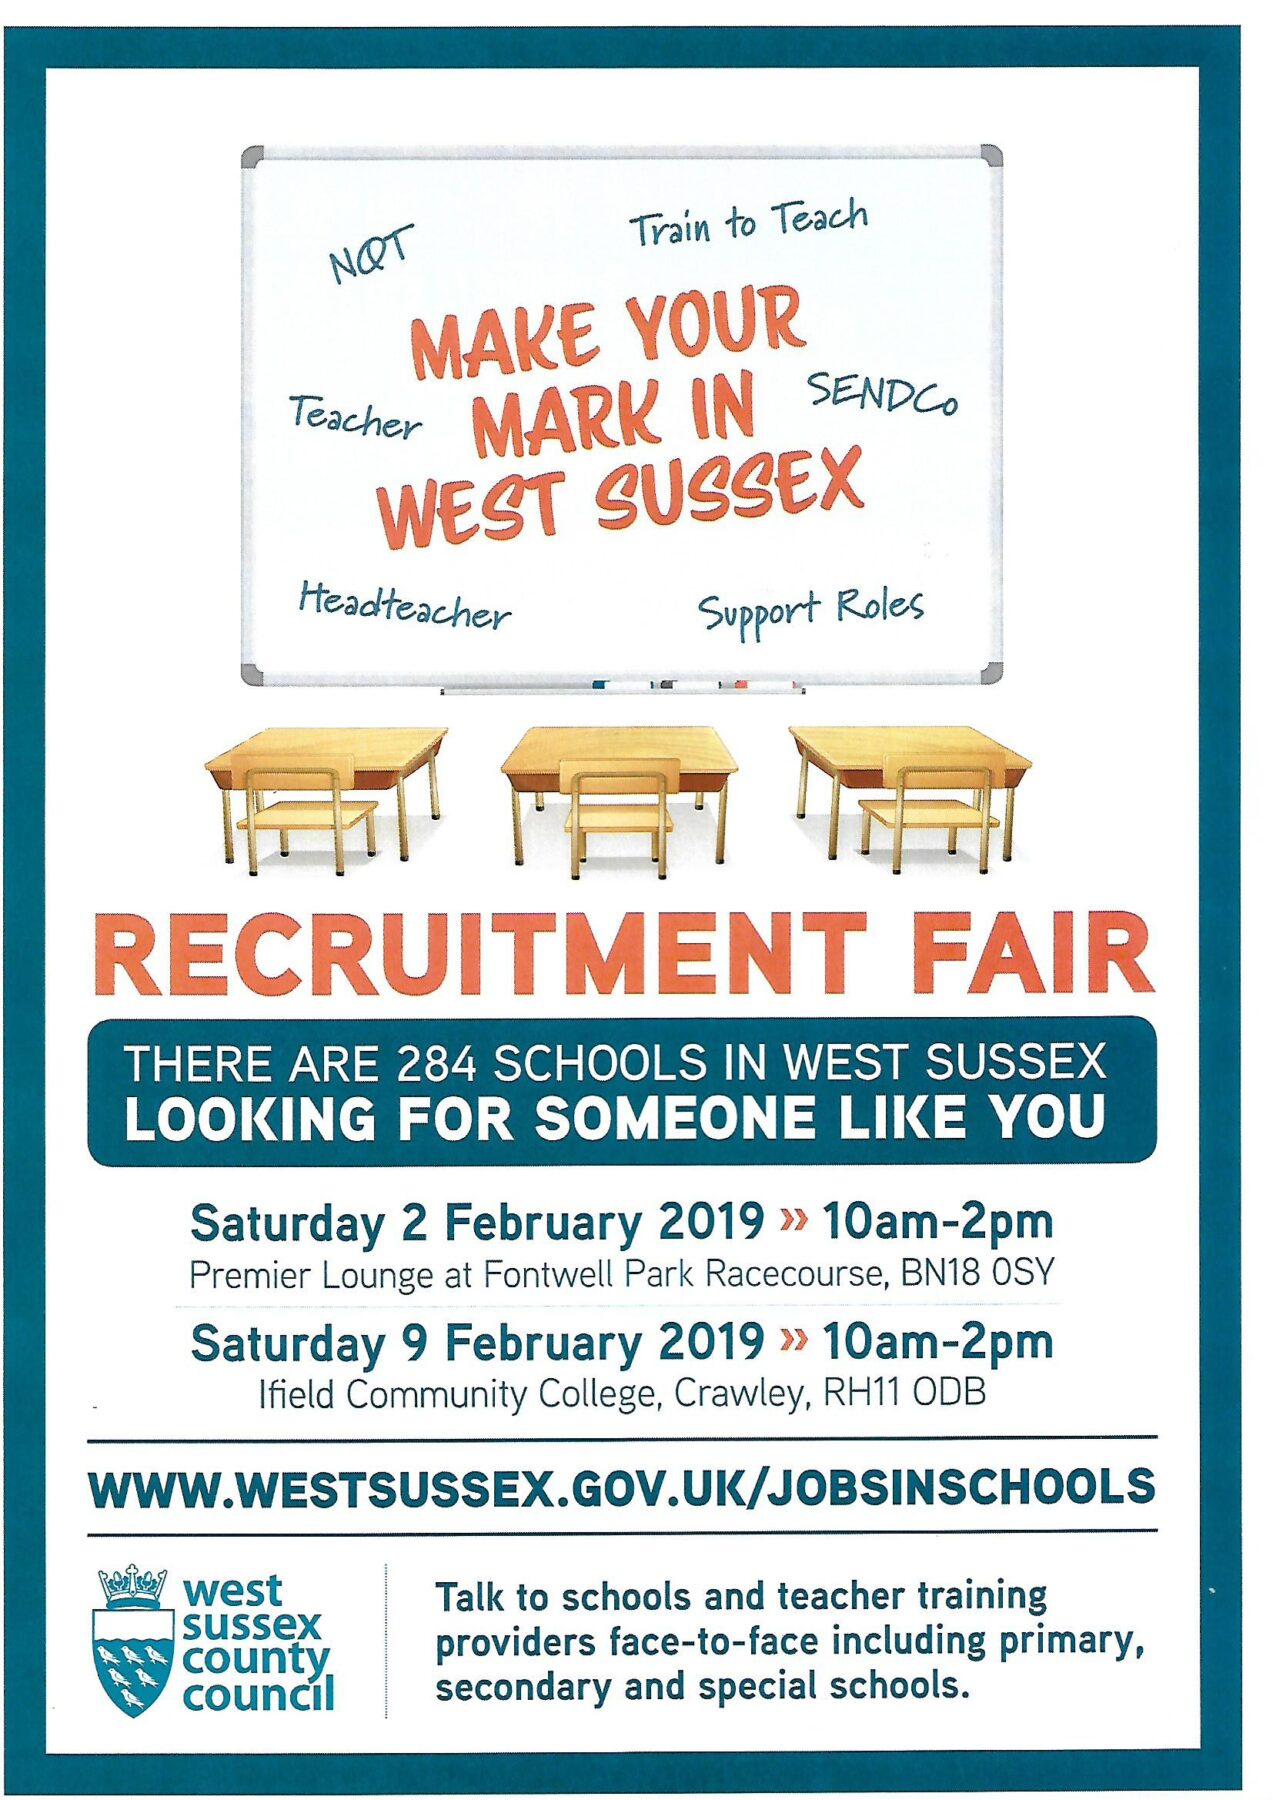 Recruitment Fair / Jobs in Schools